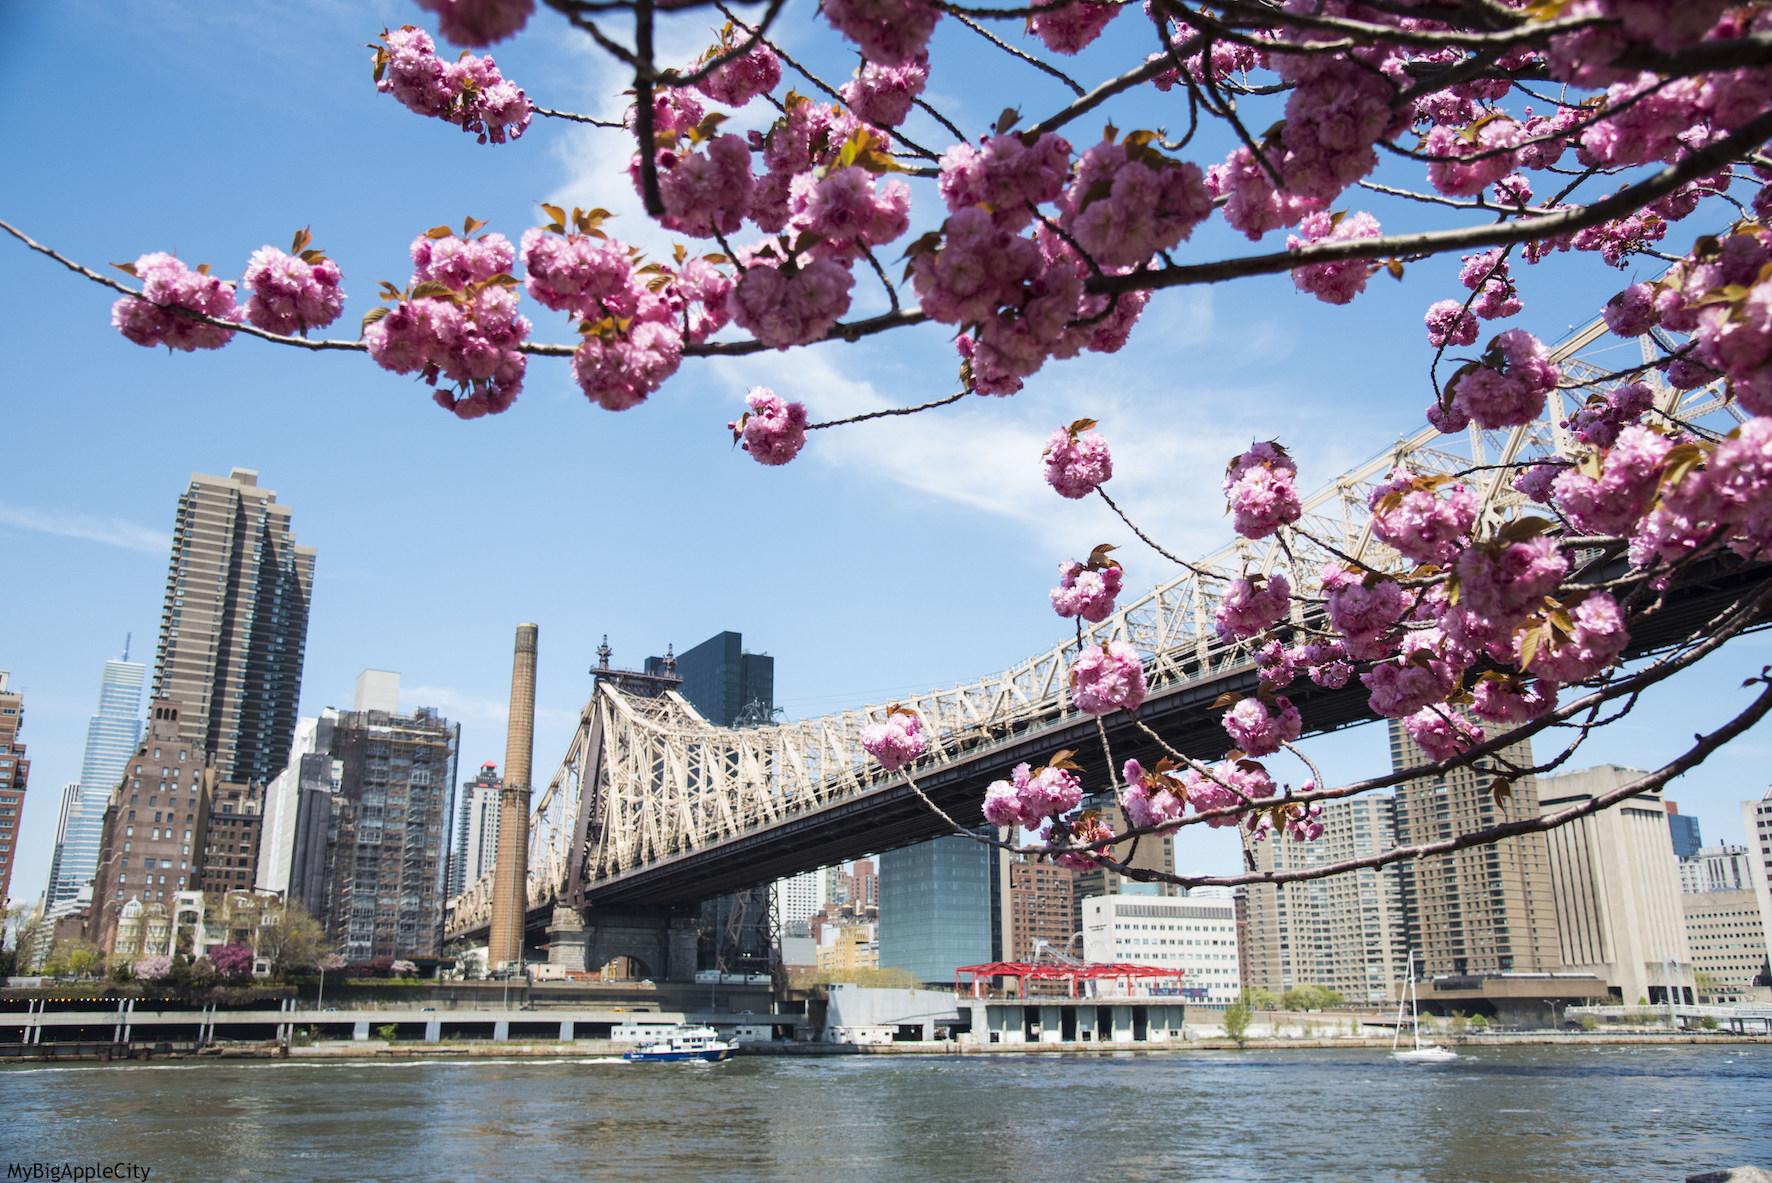 https://secureservercdn.net/45.40.146.38/e50.ce4.myftpupload.com/wp-content/uploads/2015/05/Spring-Cherry-blossom-tree-pink-New-York-Travel.jpg